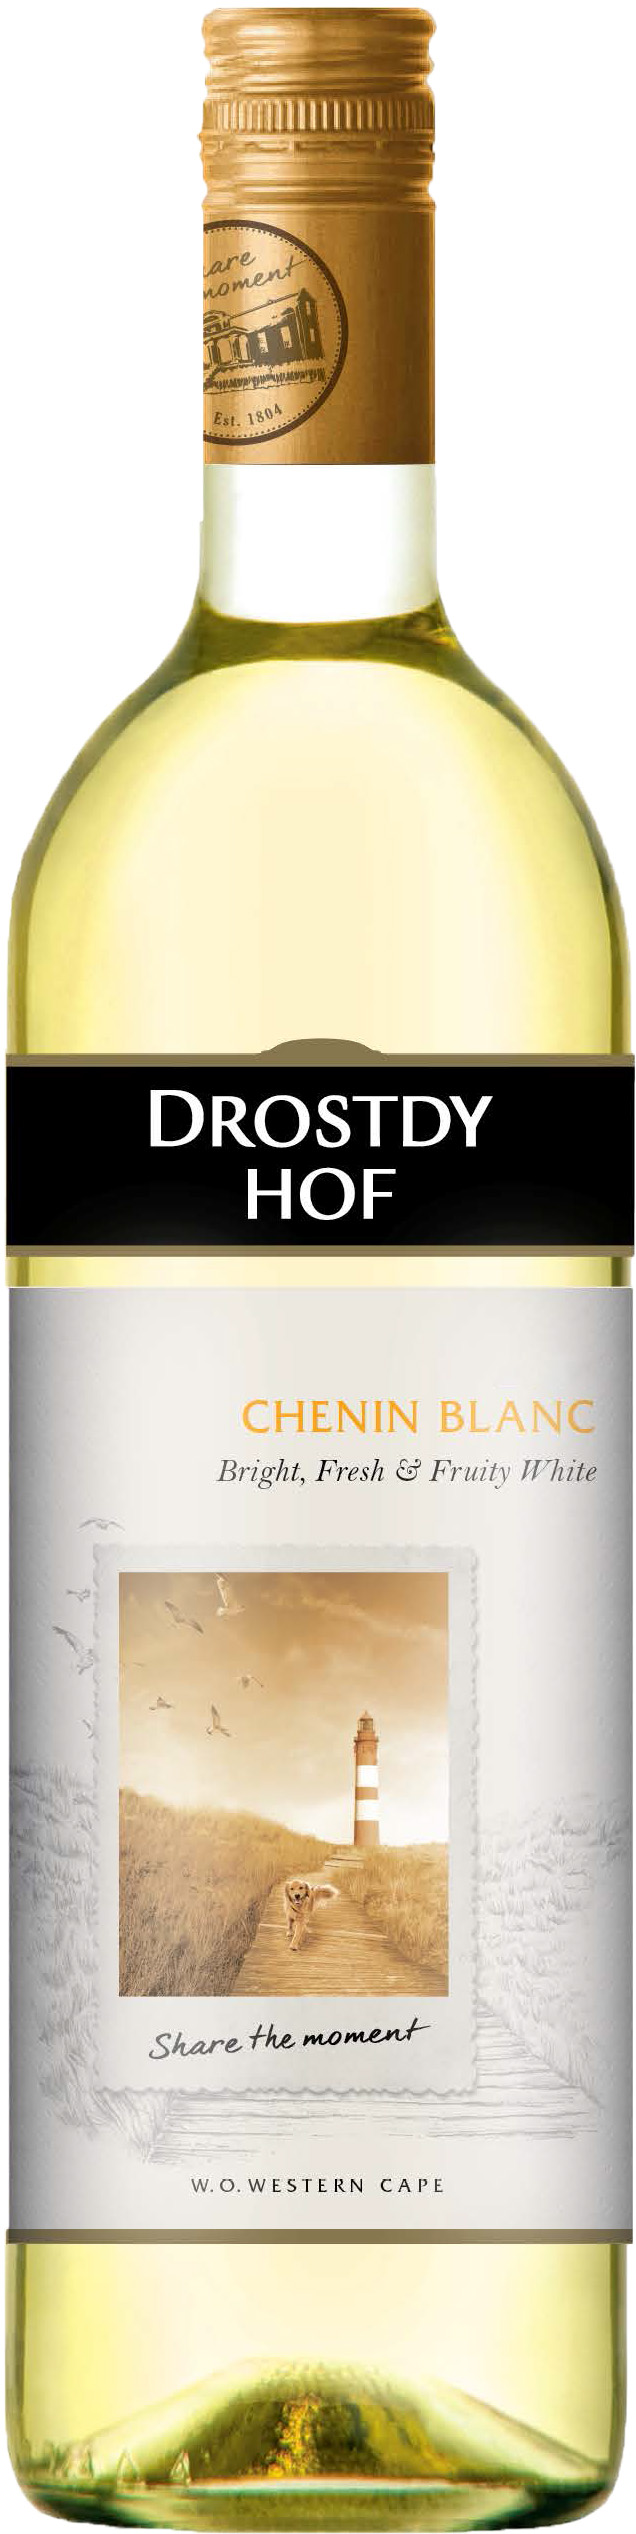 Drostdy Hof Chenin Blanc 0,75l